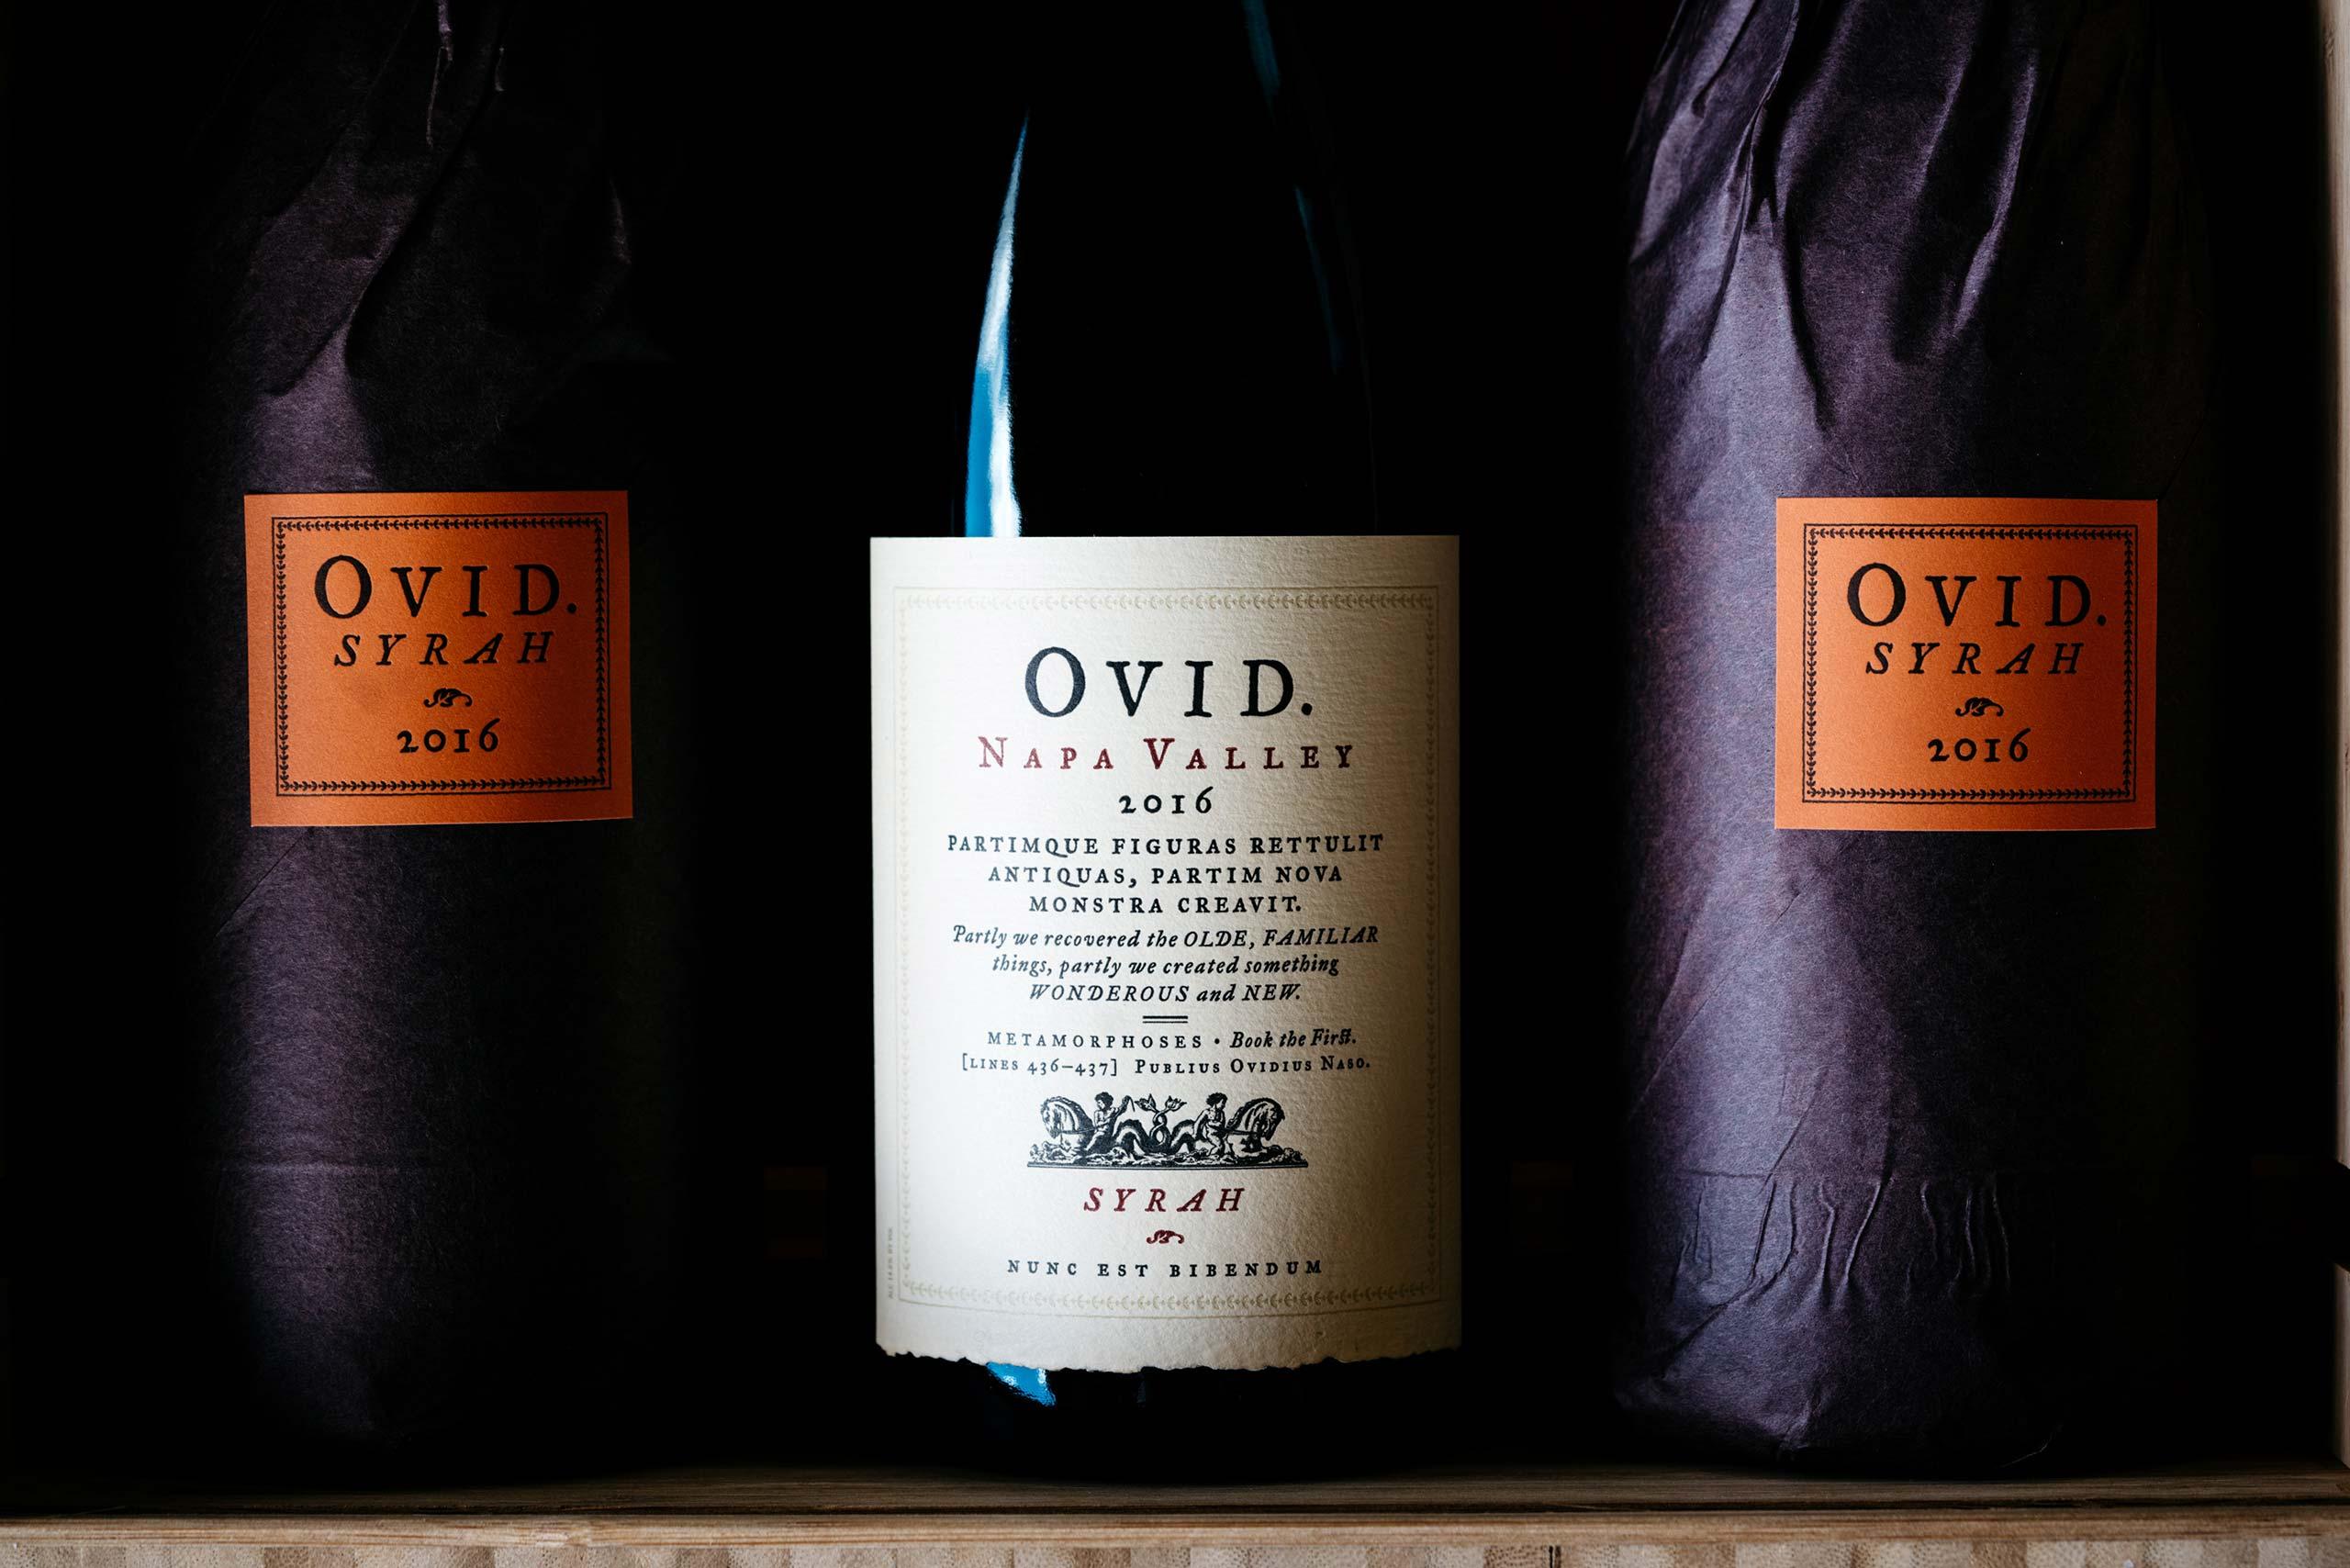 2016 OVID Napa Valley Syrah botles